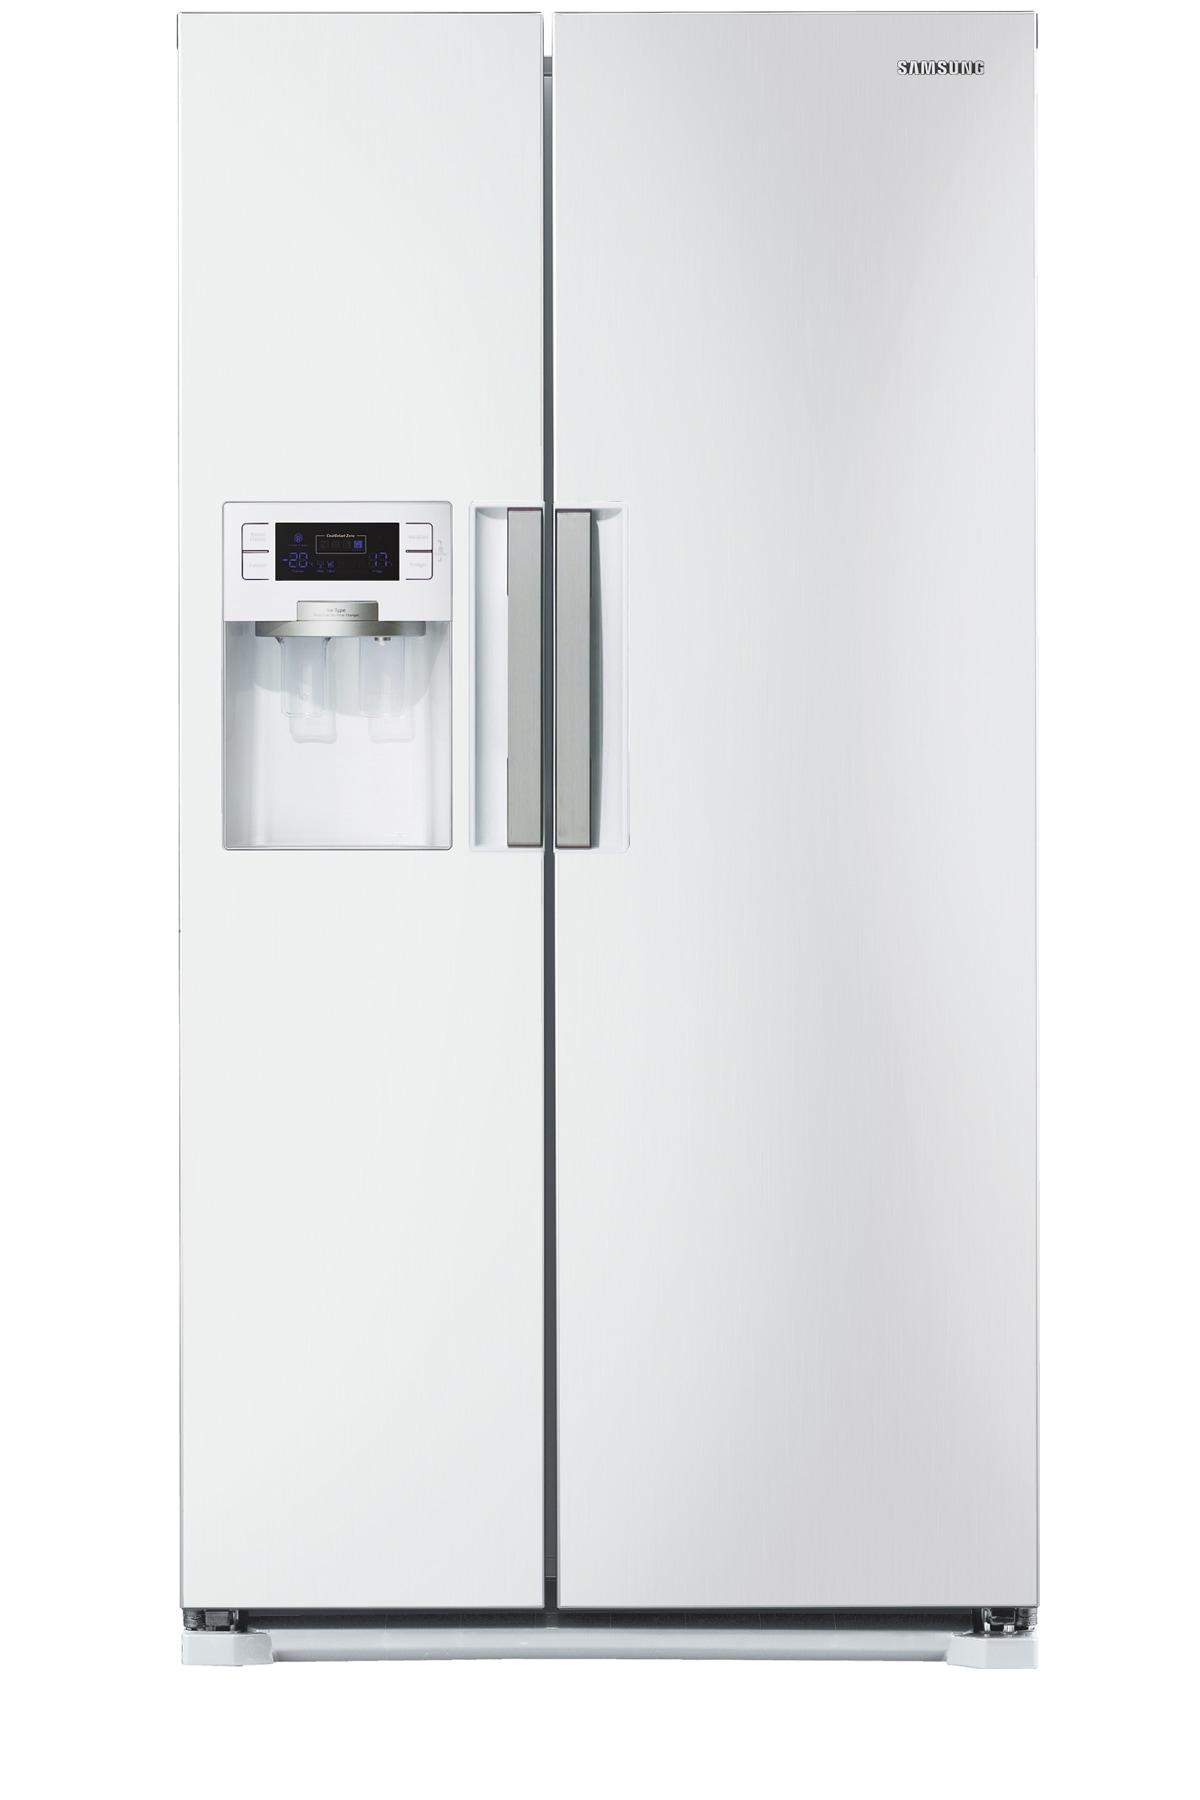 RSH7UNSW H-Series American Style Fridge FreezerFront2 White